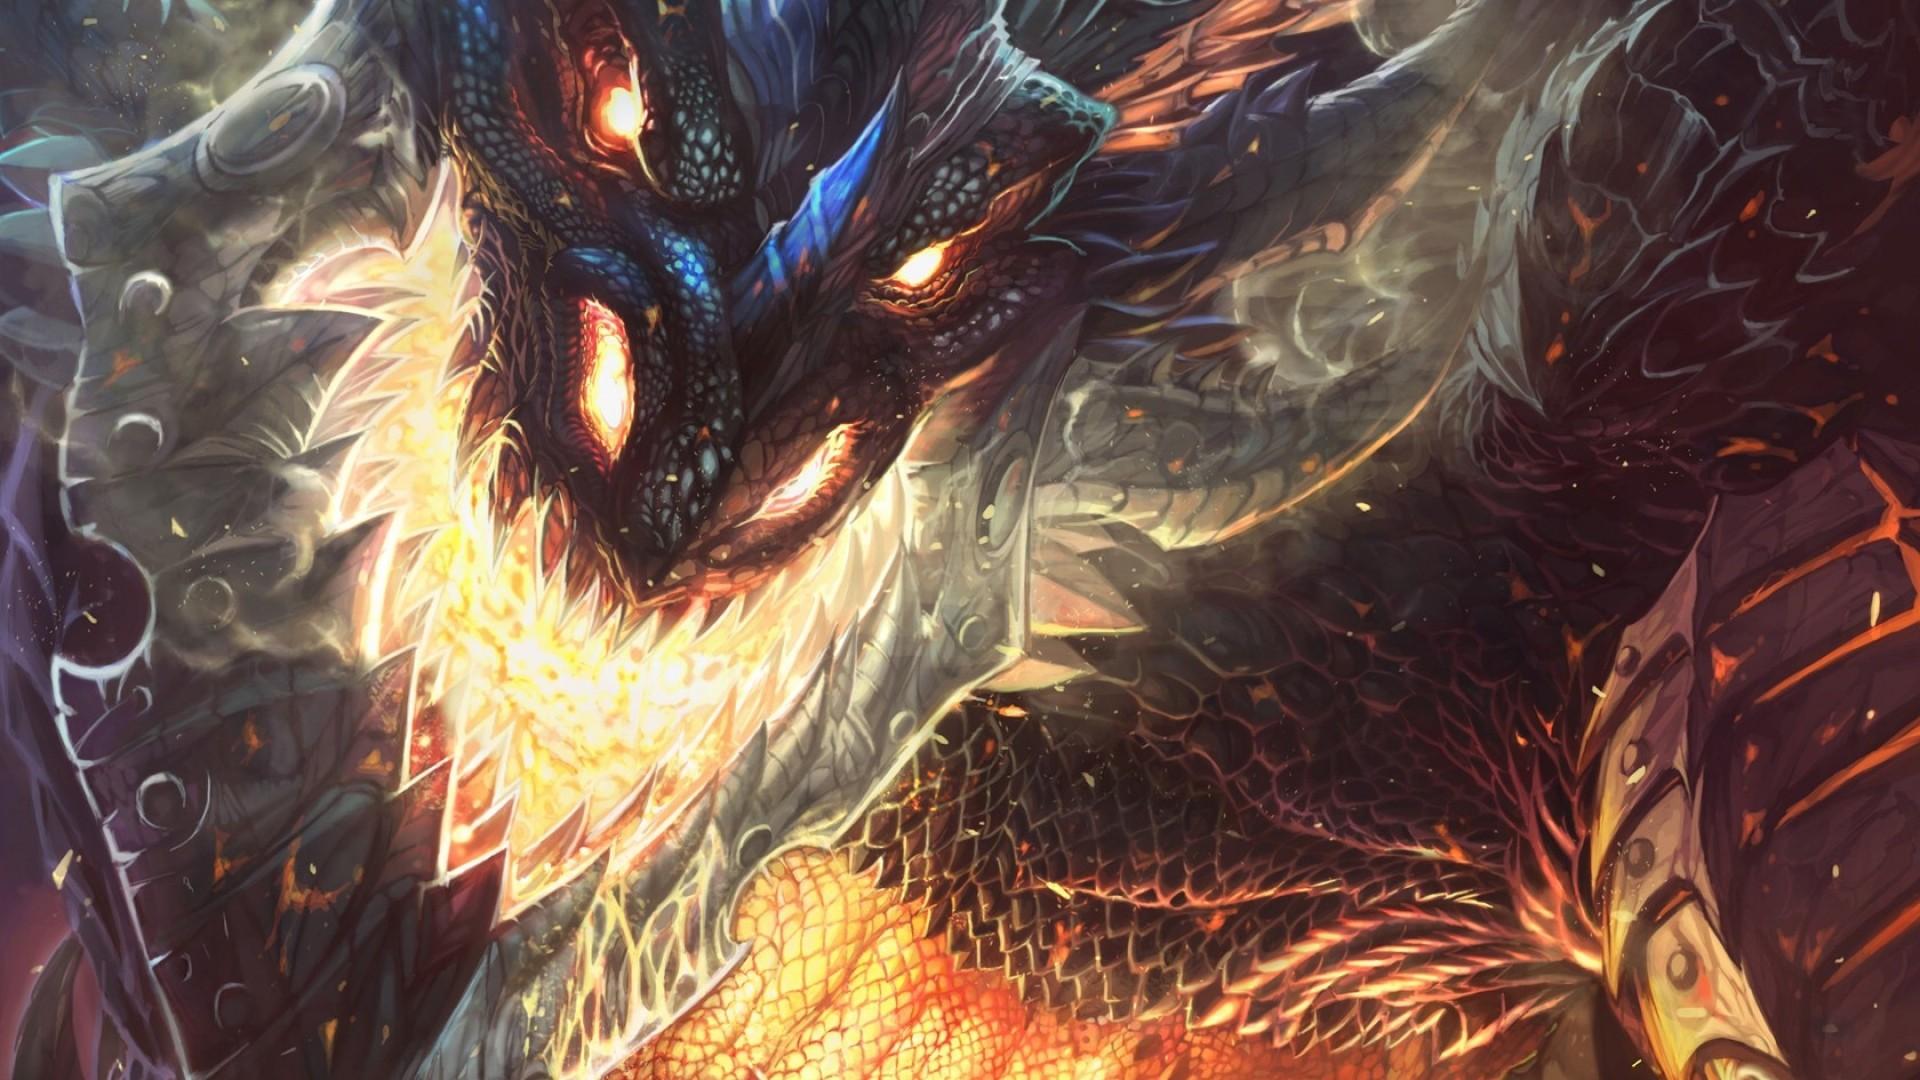 … Background Full HD 1080p. Wallpaper world of warcraft,  cataclysm, dragon, face, fire